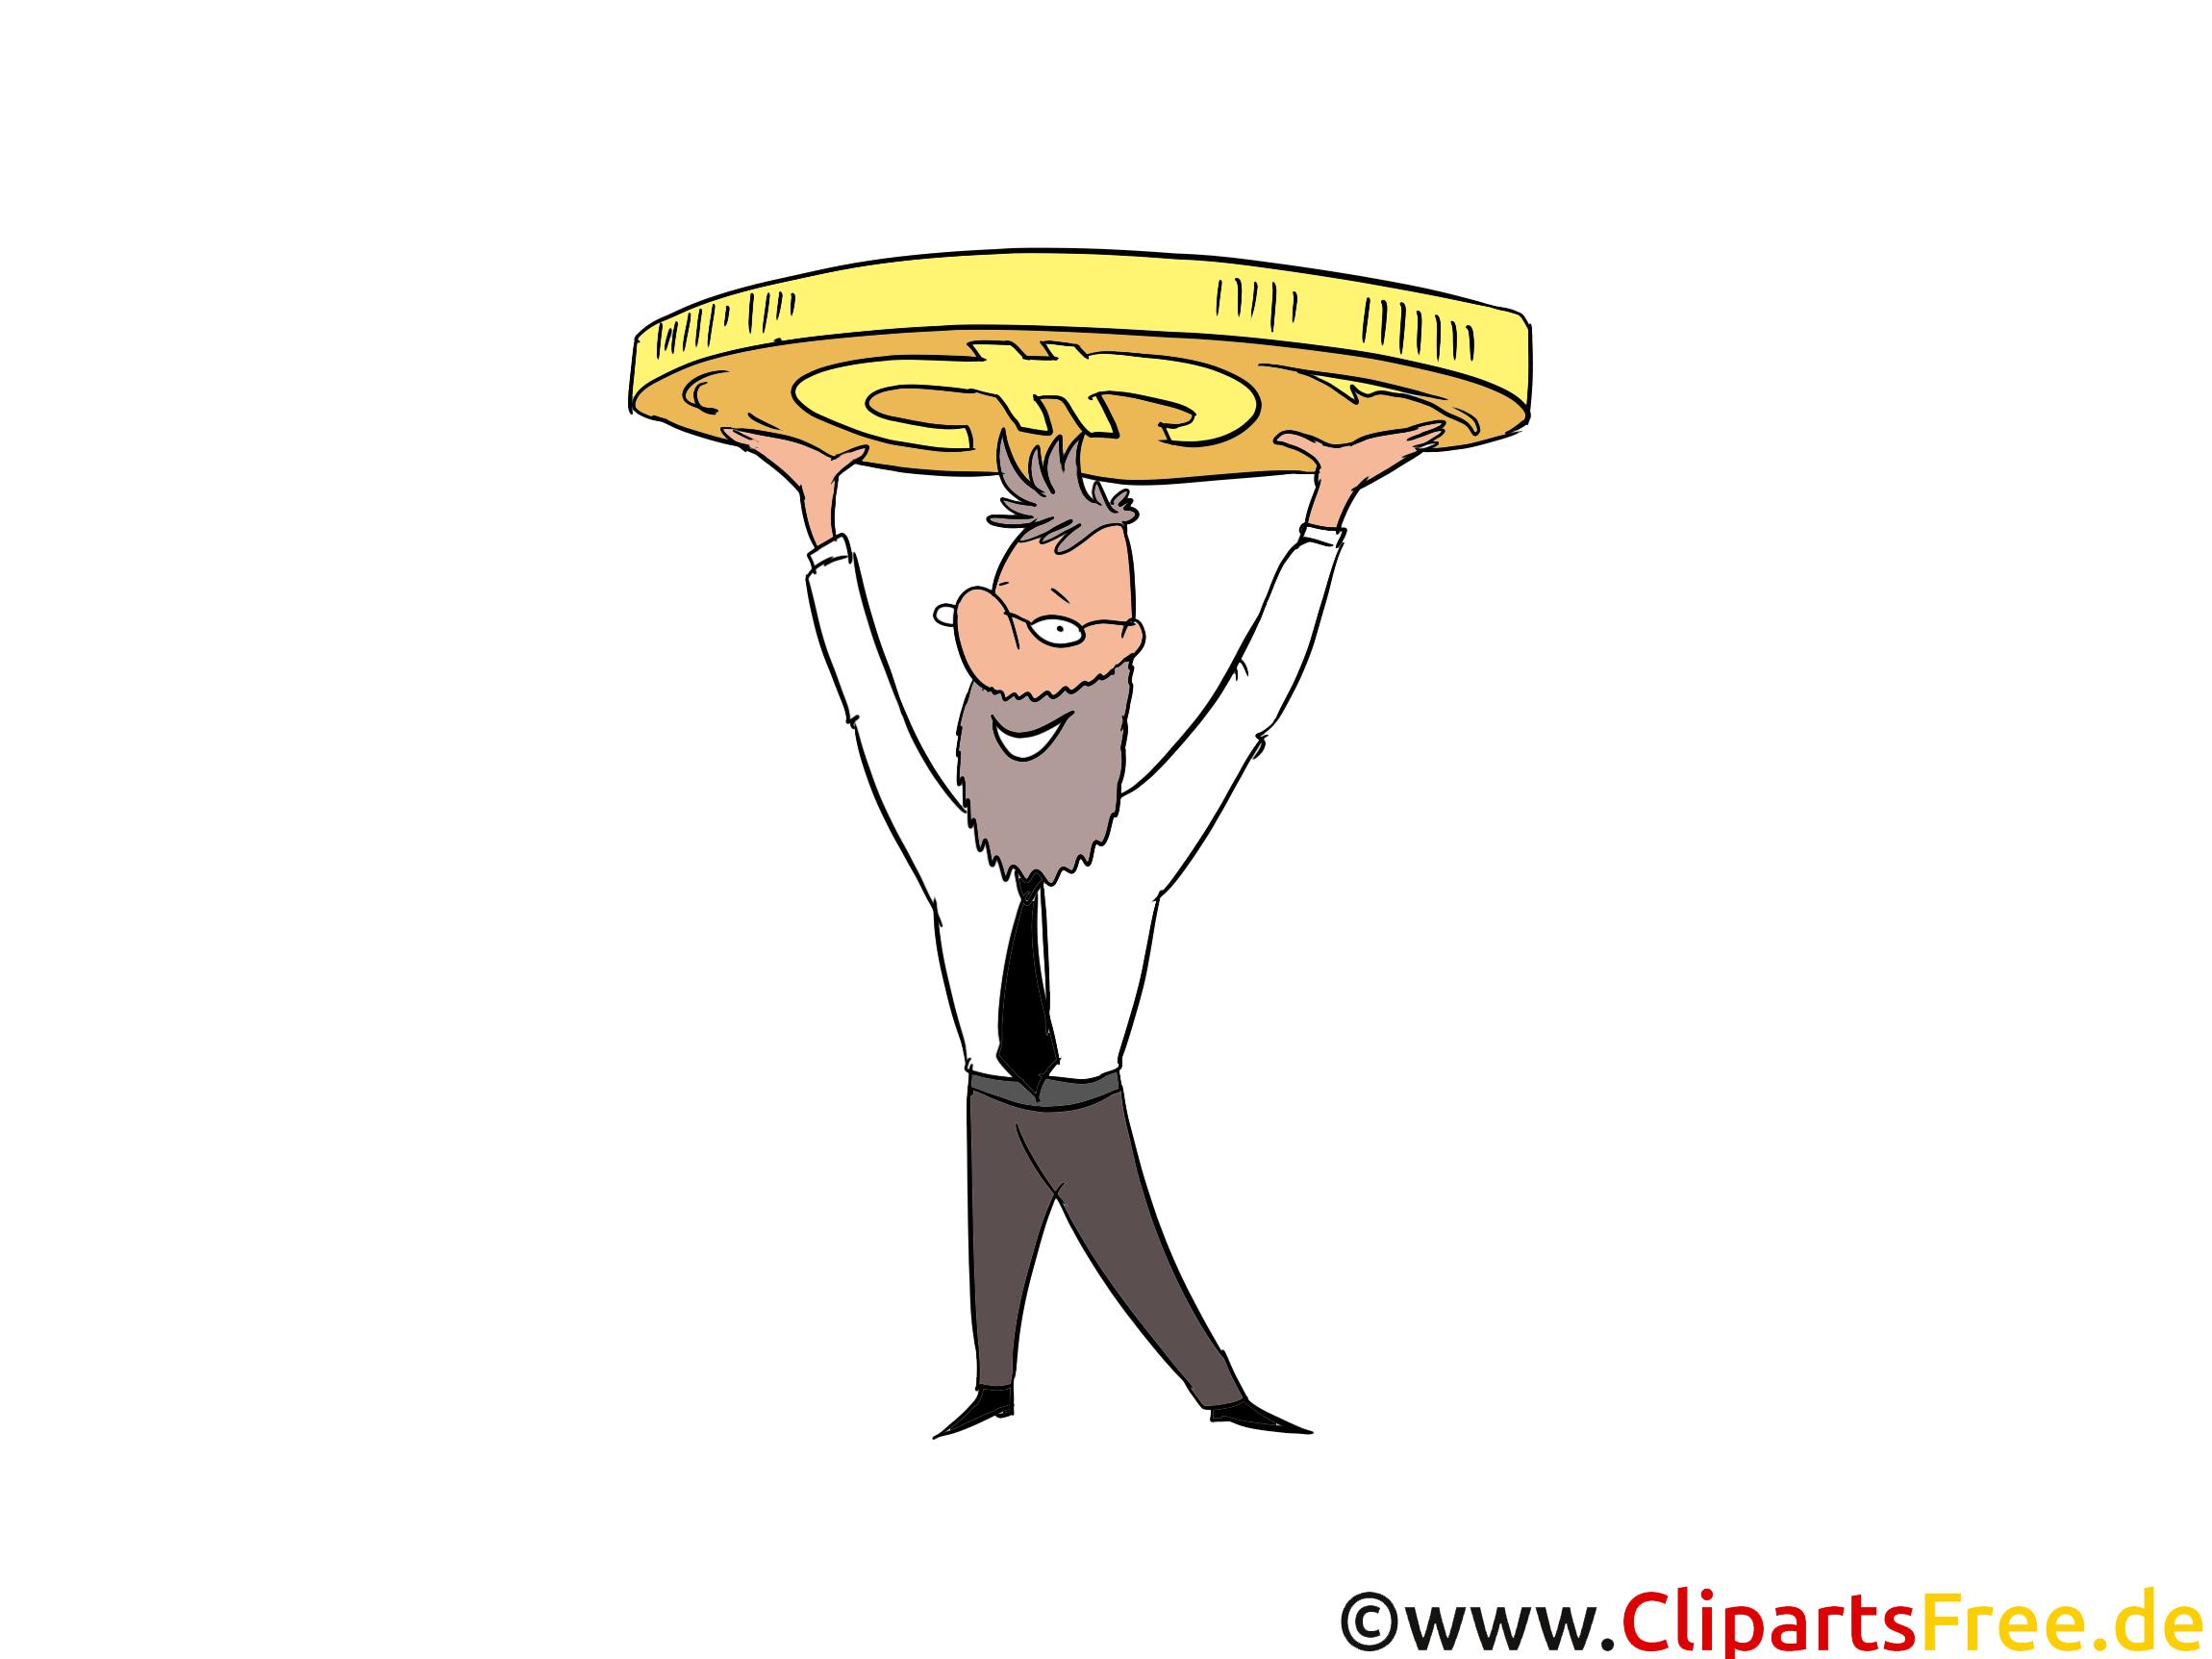 Münze Clipart, Bild, Cartoon, Comic, Illustration, Grafik kostenlos